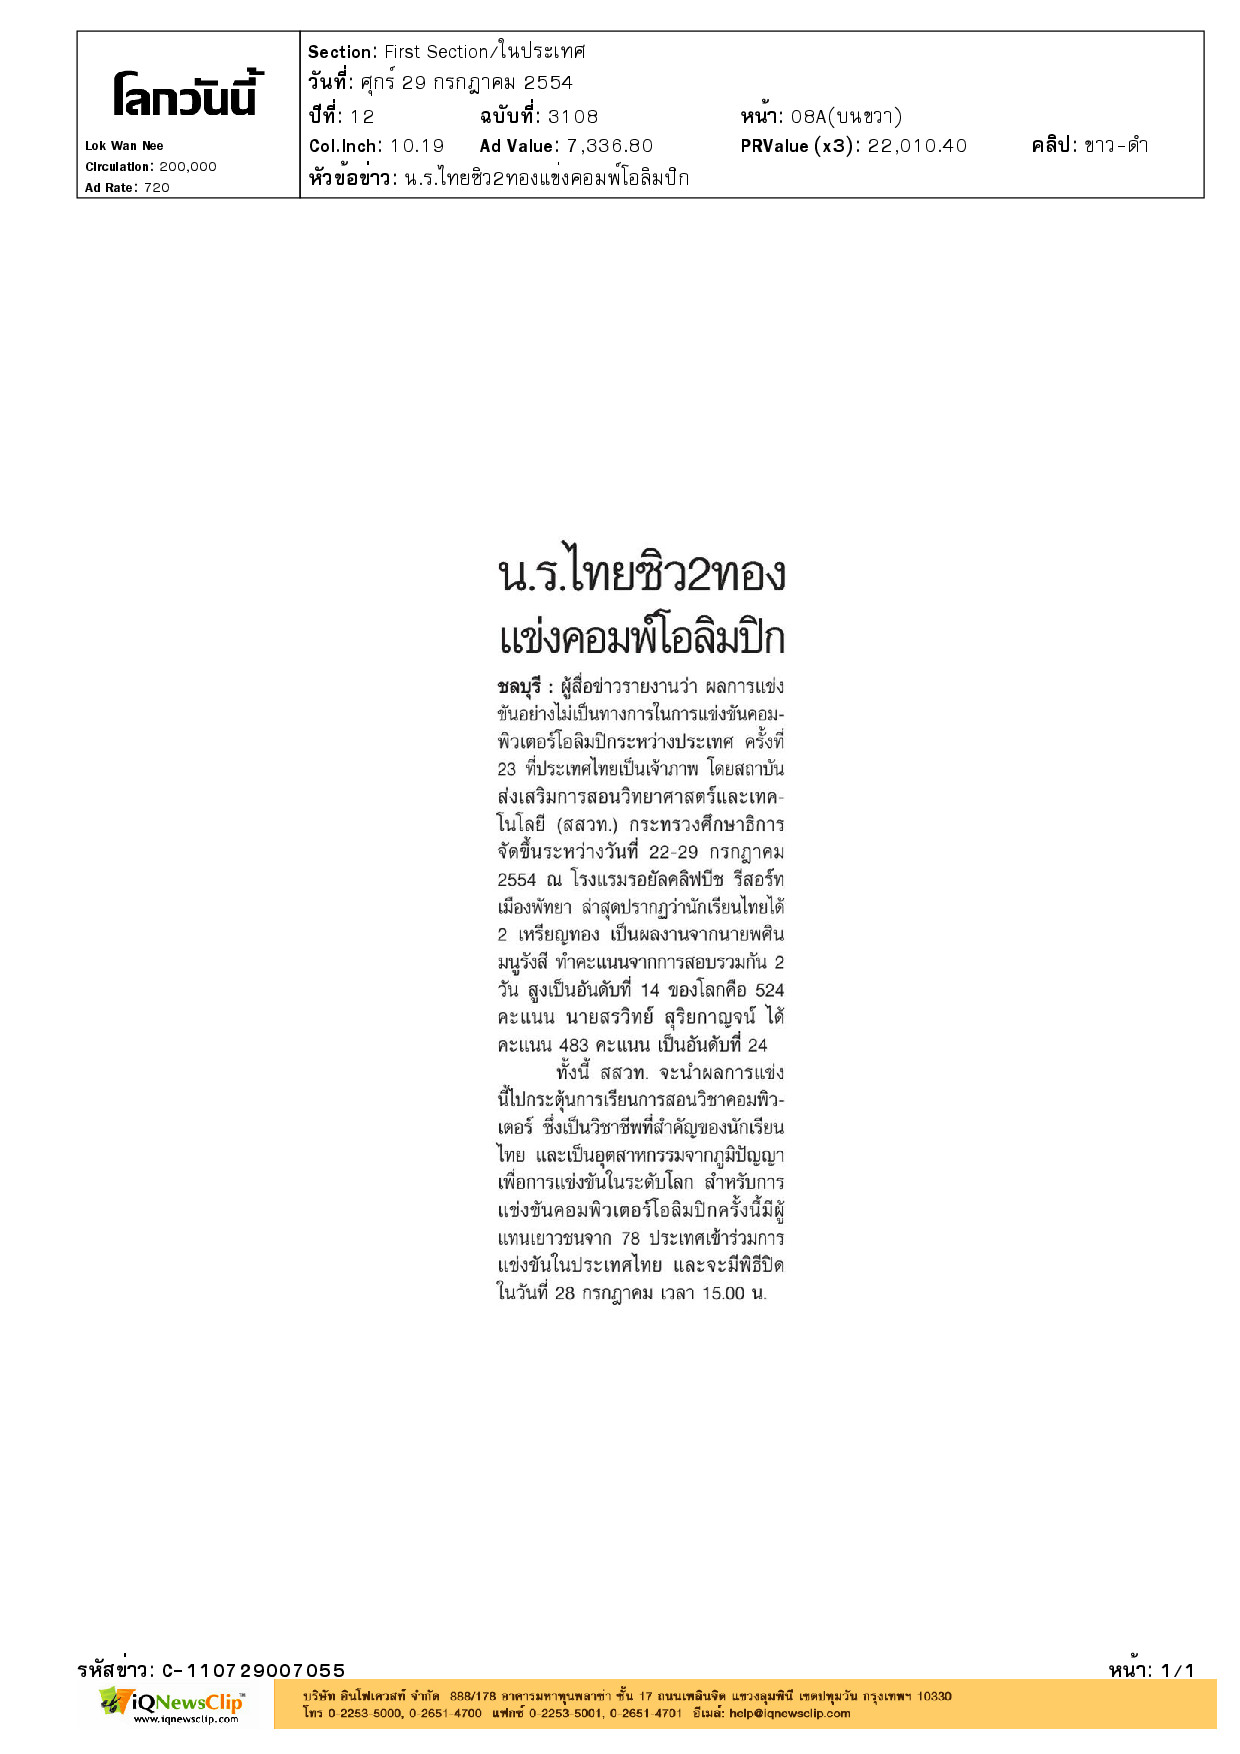 C-110729007055.pdf